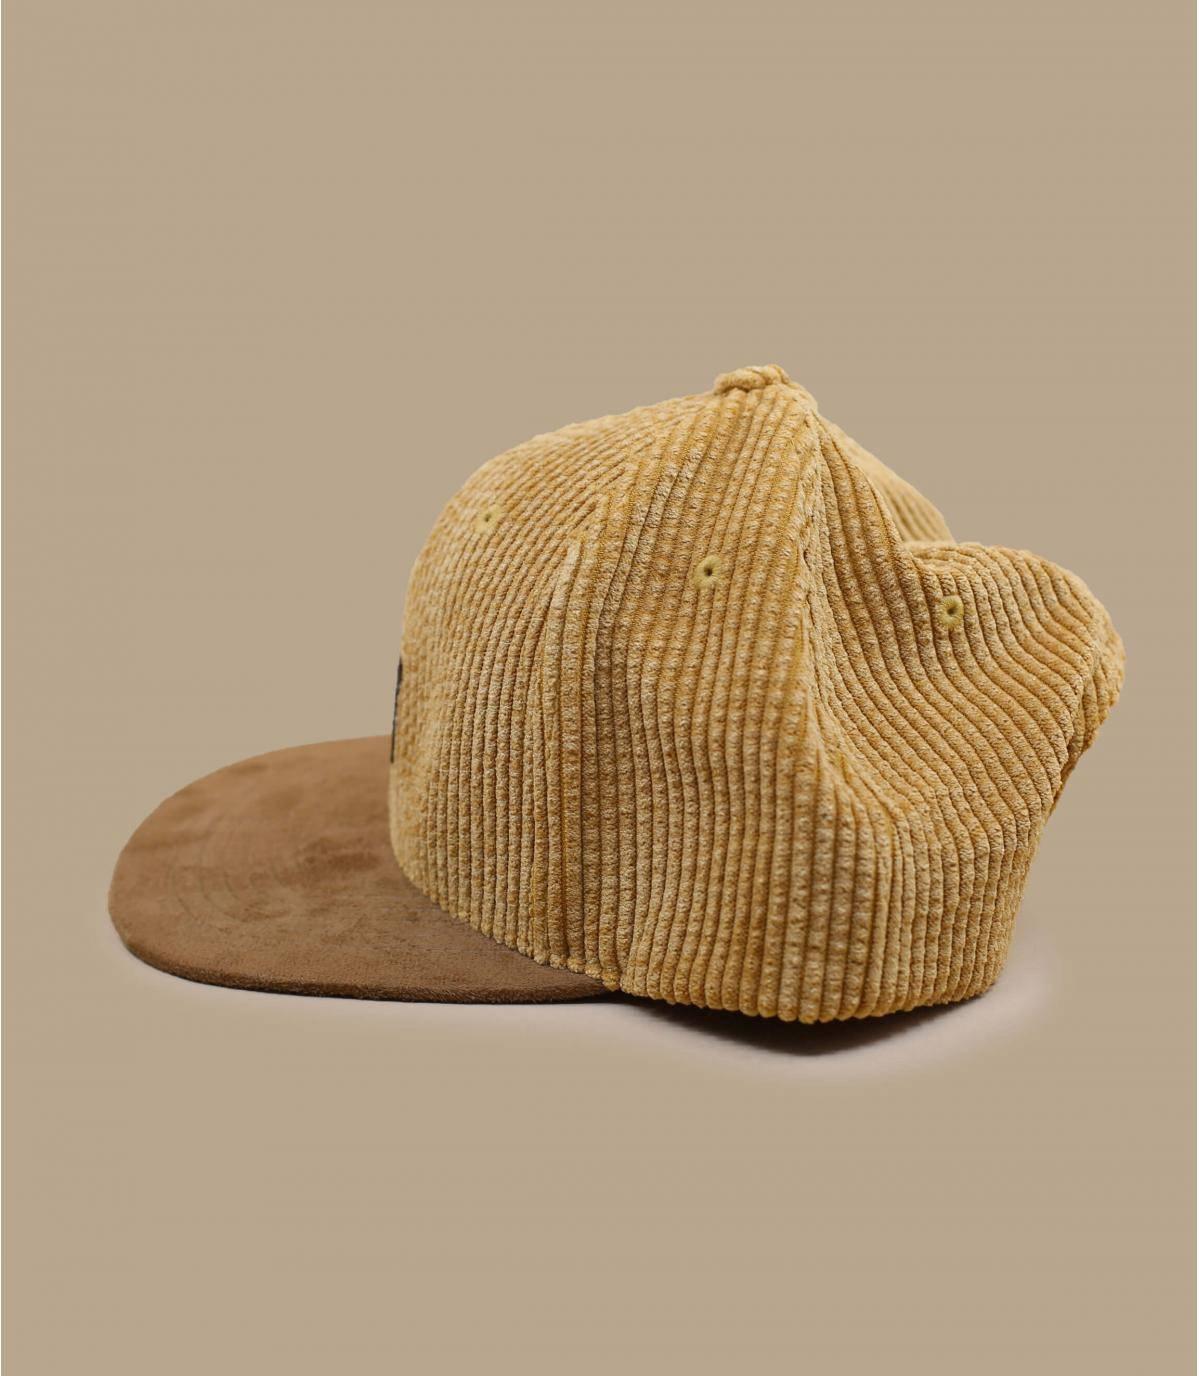 Dettagli Suede Cap Cord beige - image 3